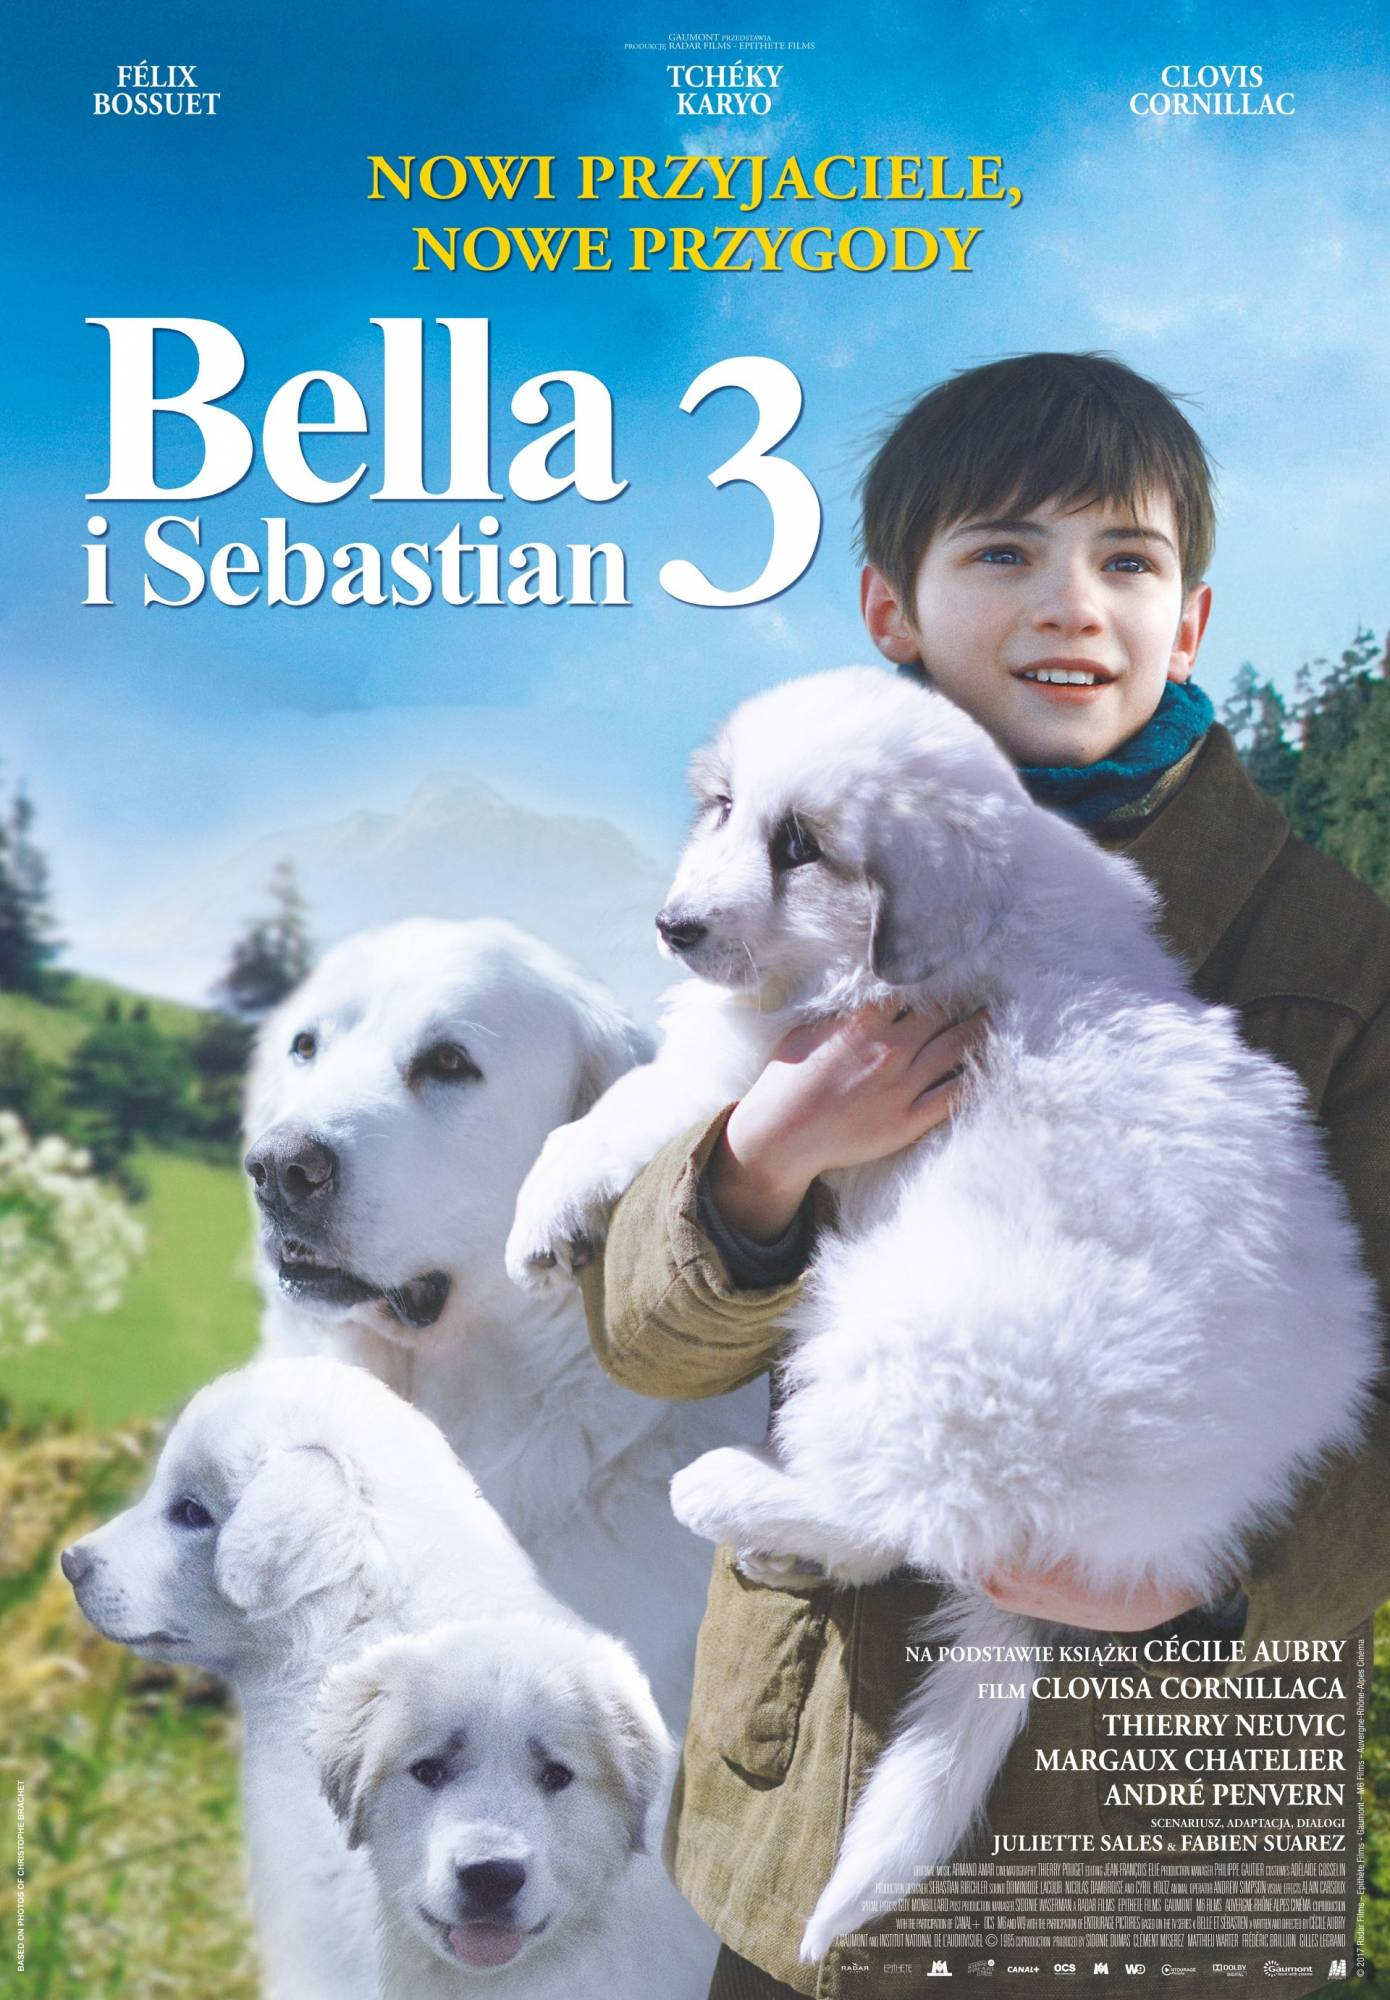 bella-i-sebastian-3-plakat-01.jpg